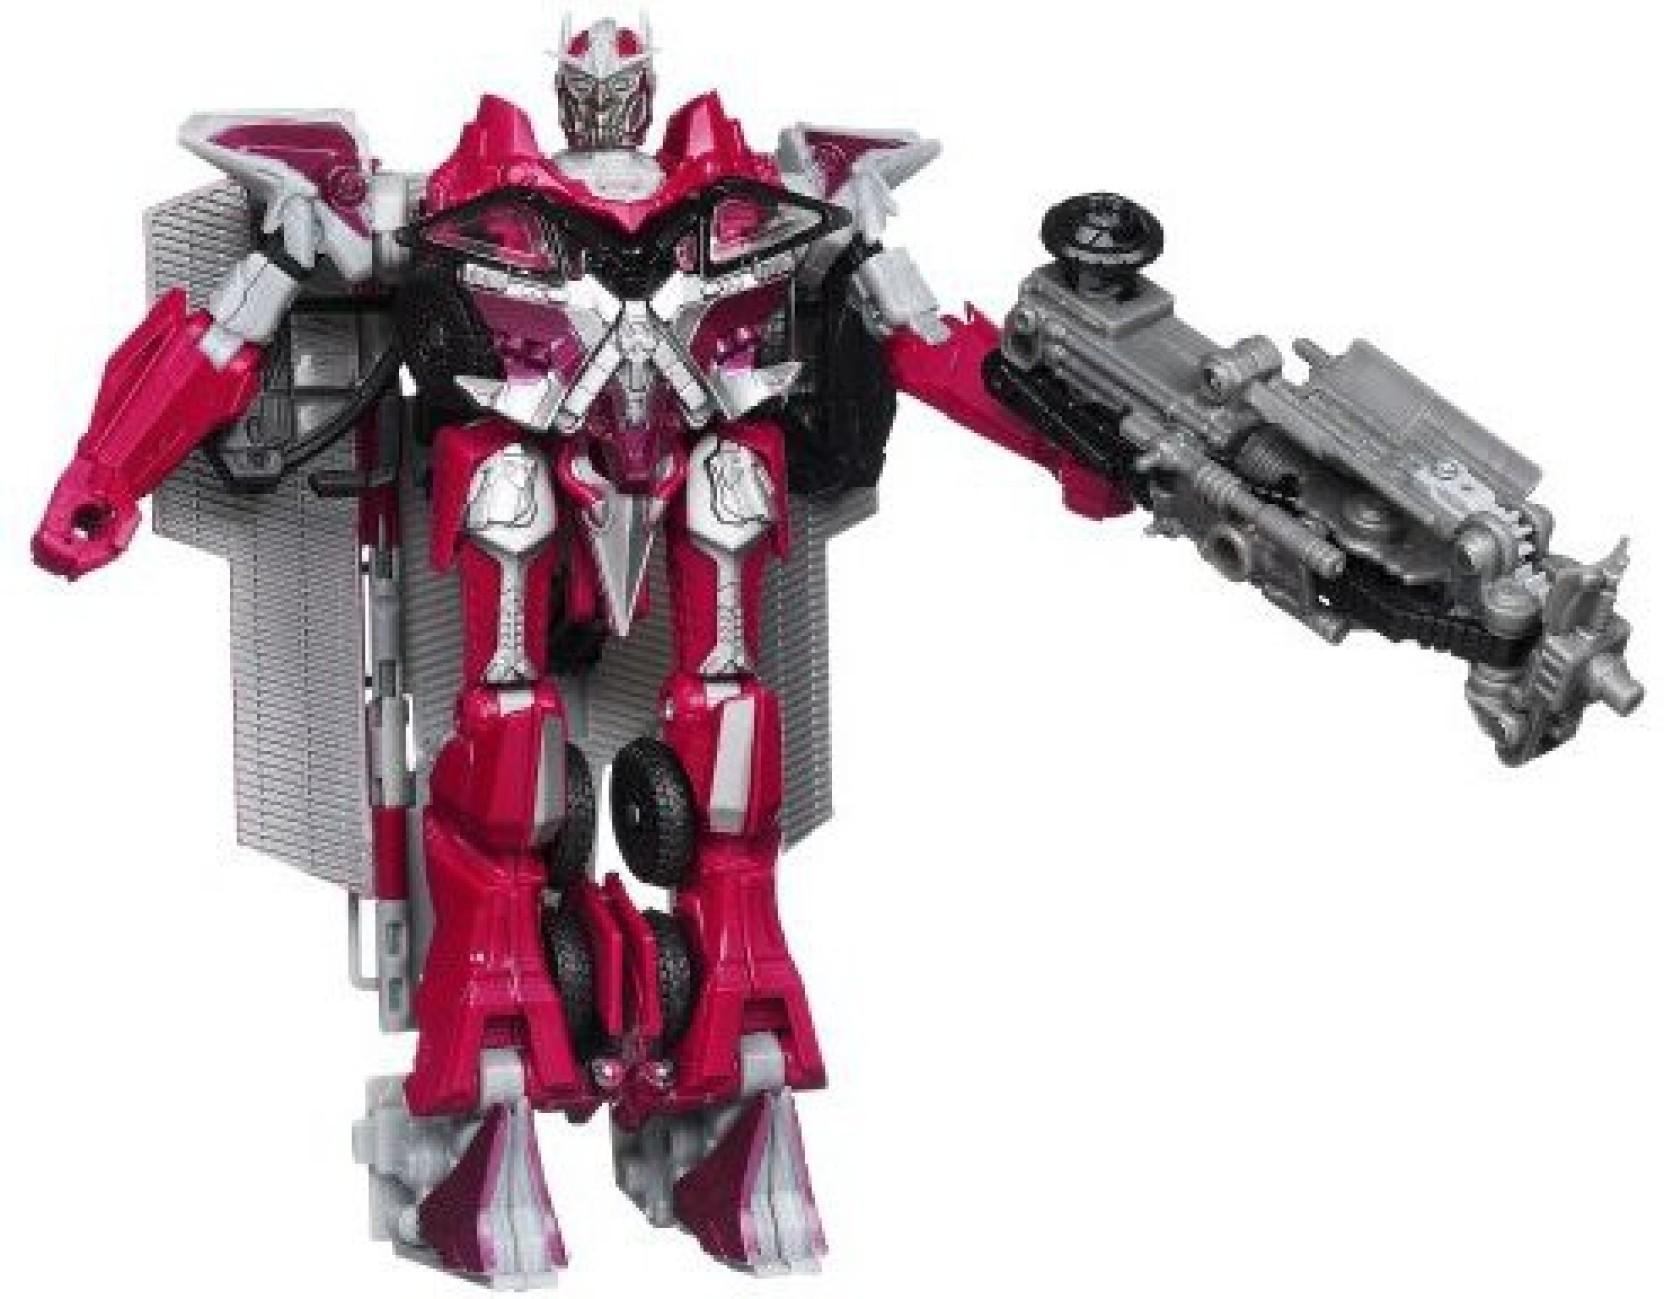 transformers dark of the moon - mechtech voyager - sentinel prime